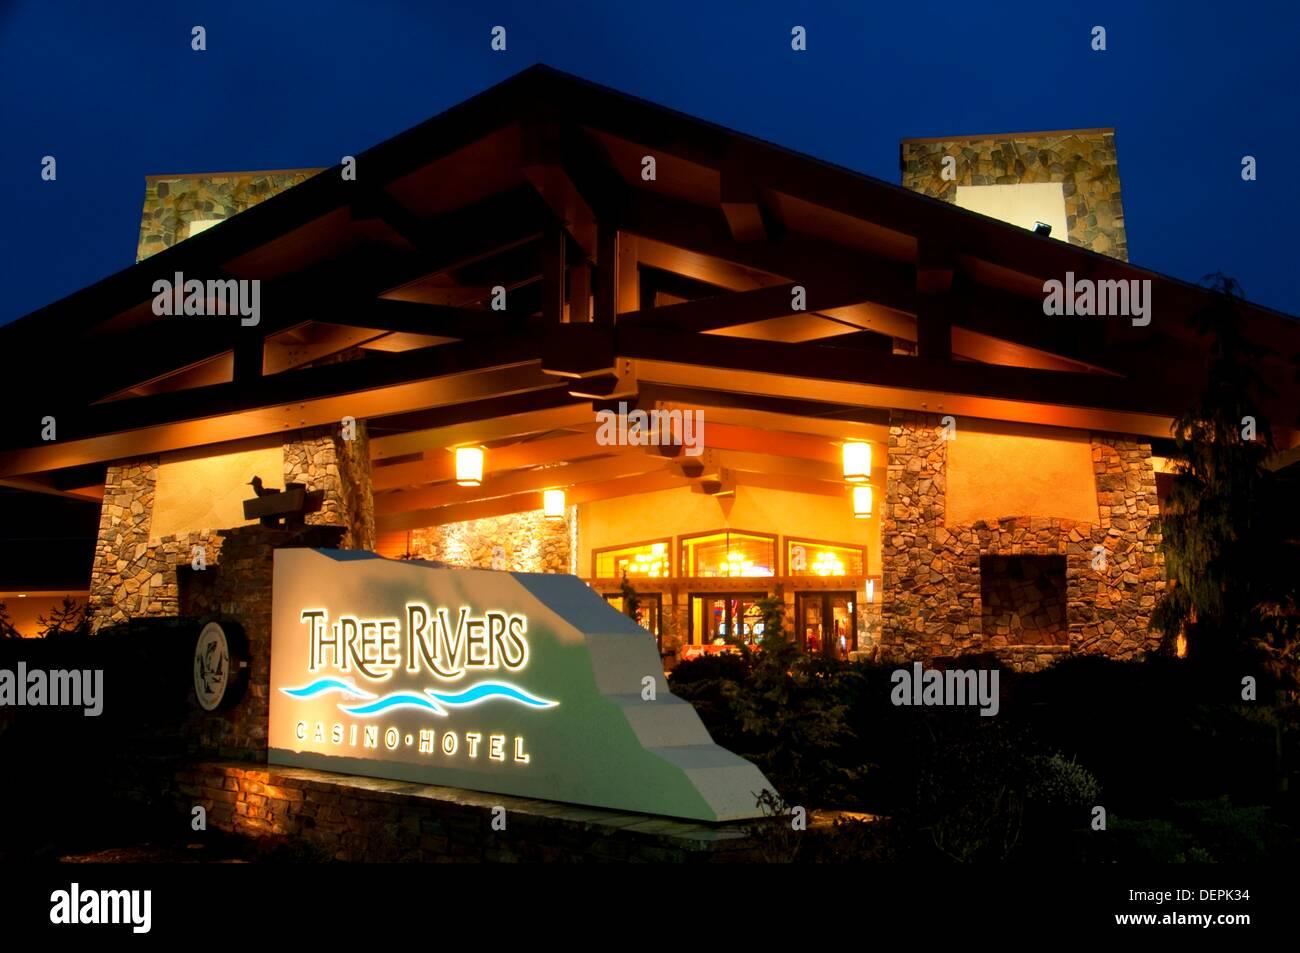 Three rivers casino florence oregon poker iphone 1 sim card slot